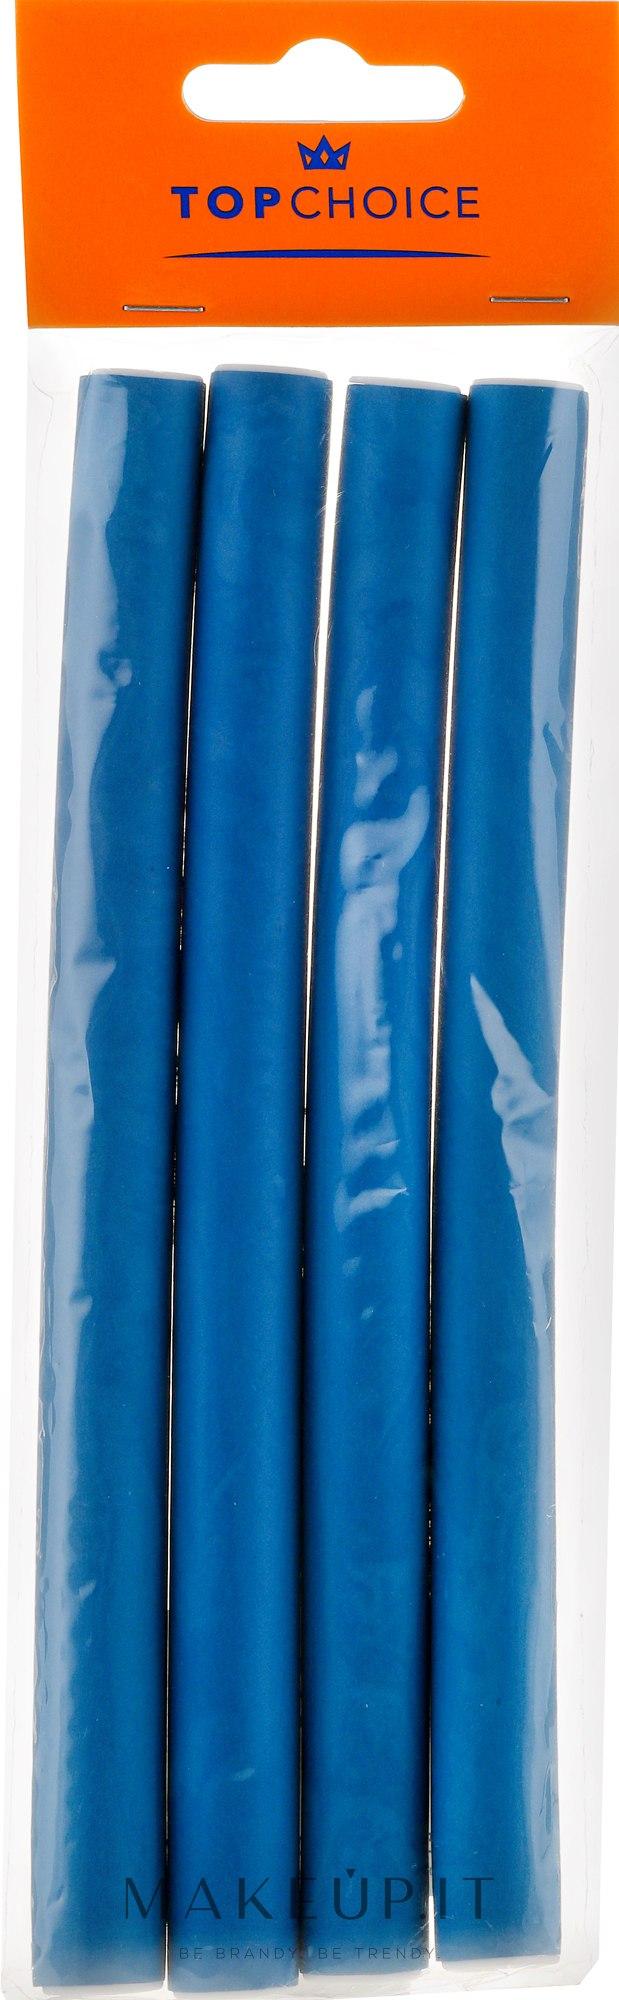 Bigodini M 4 pz, blu - Top Choice — foto 4 pz.